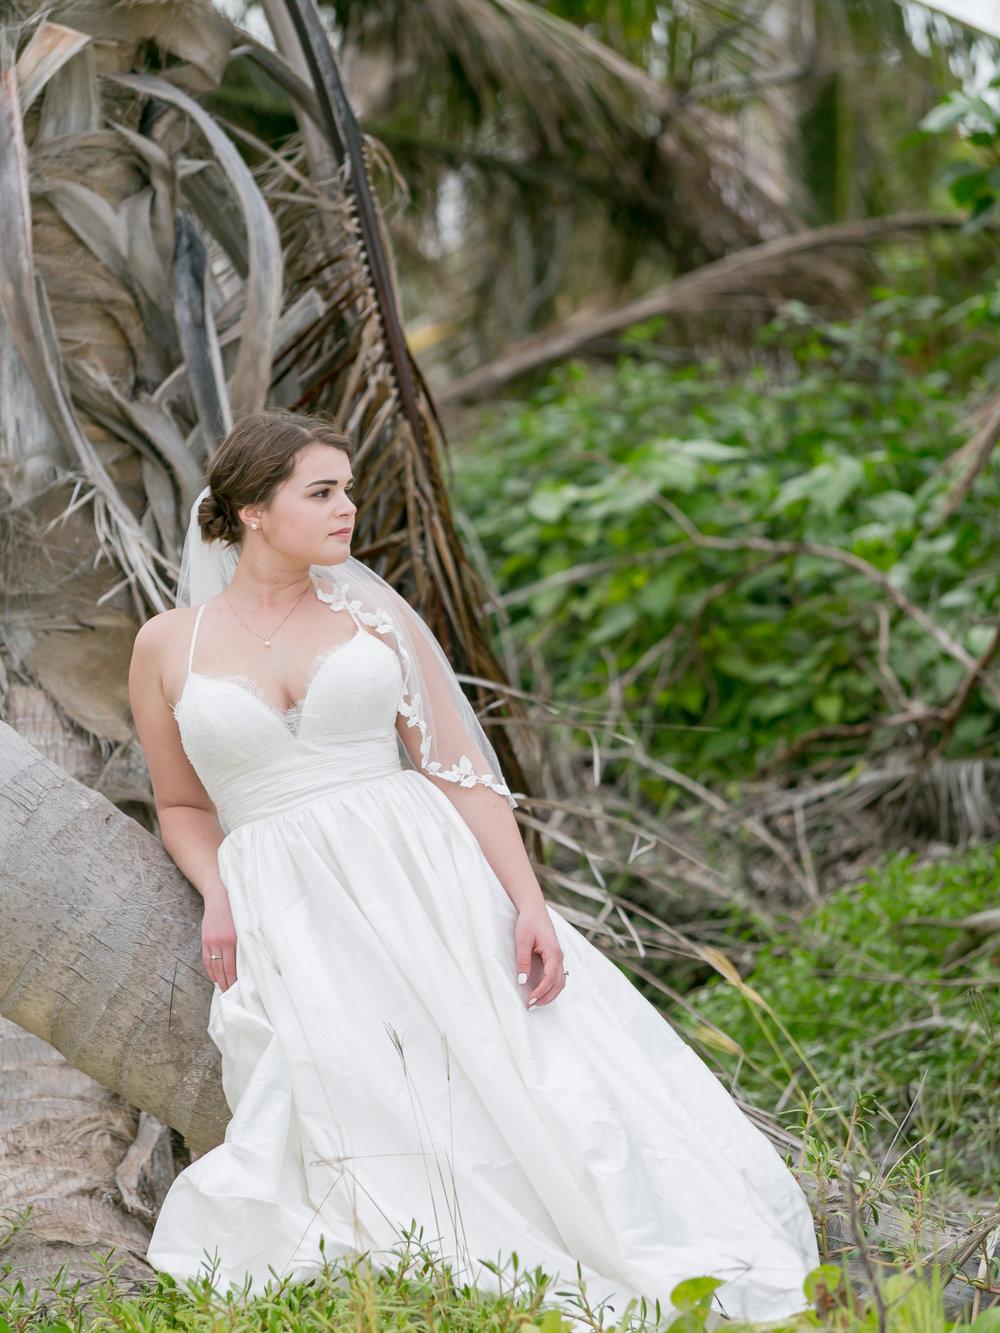 Cayco-Coco-Cuba-Wedding-522.jpg